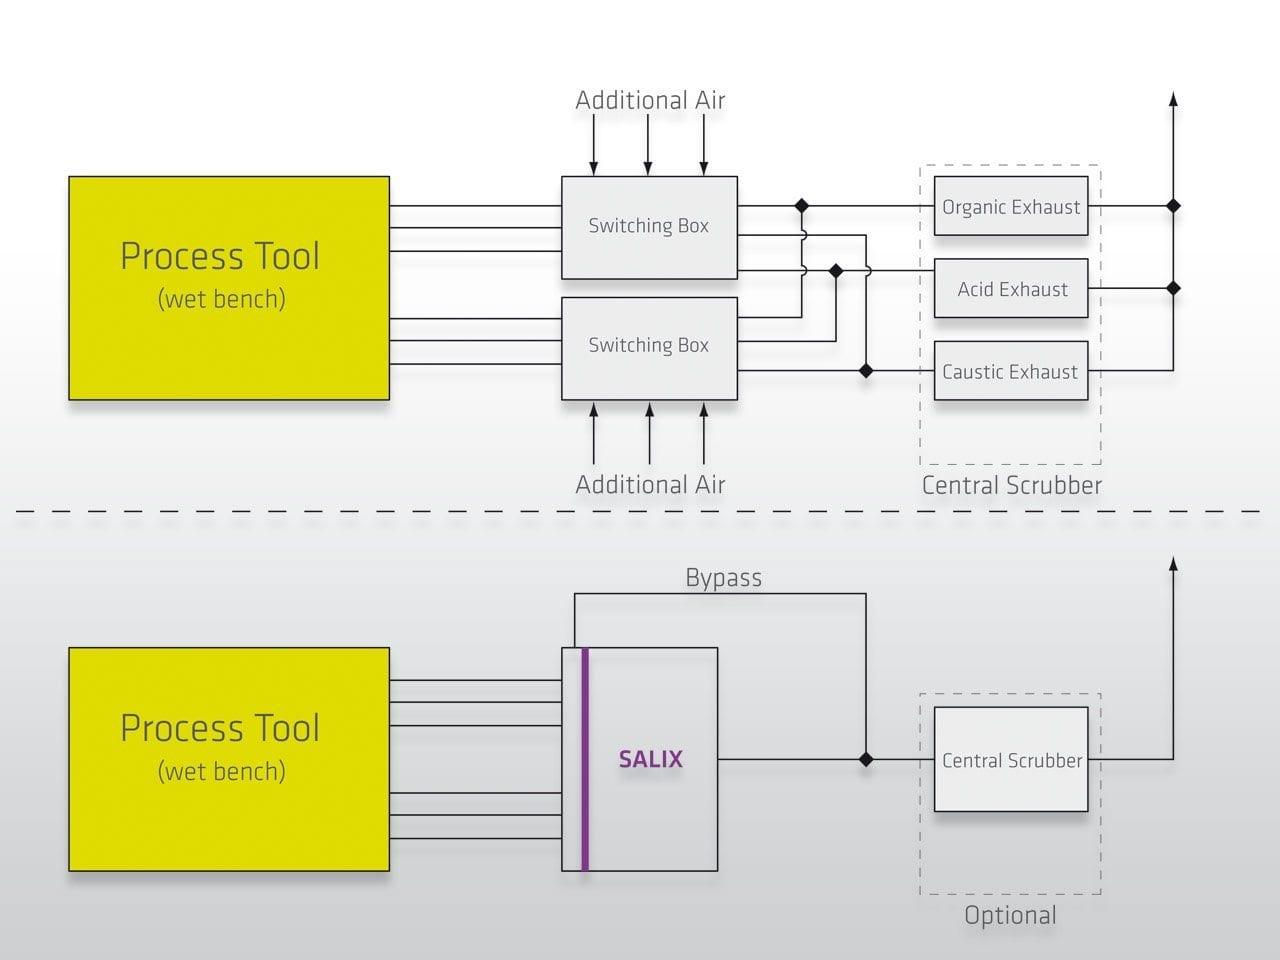 Case Study Waste Gas Treatment Wet Bench Processes | DAS